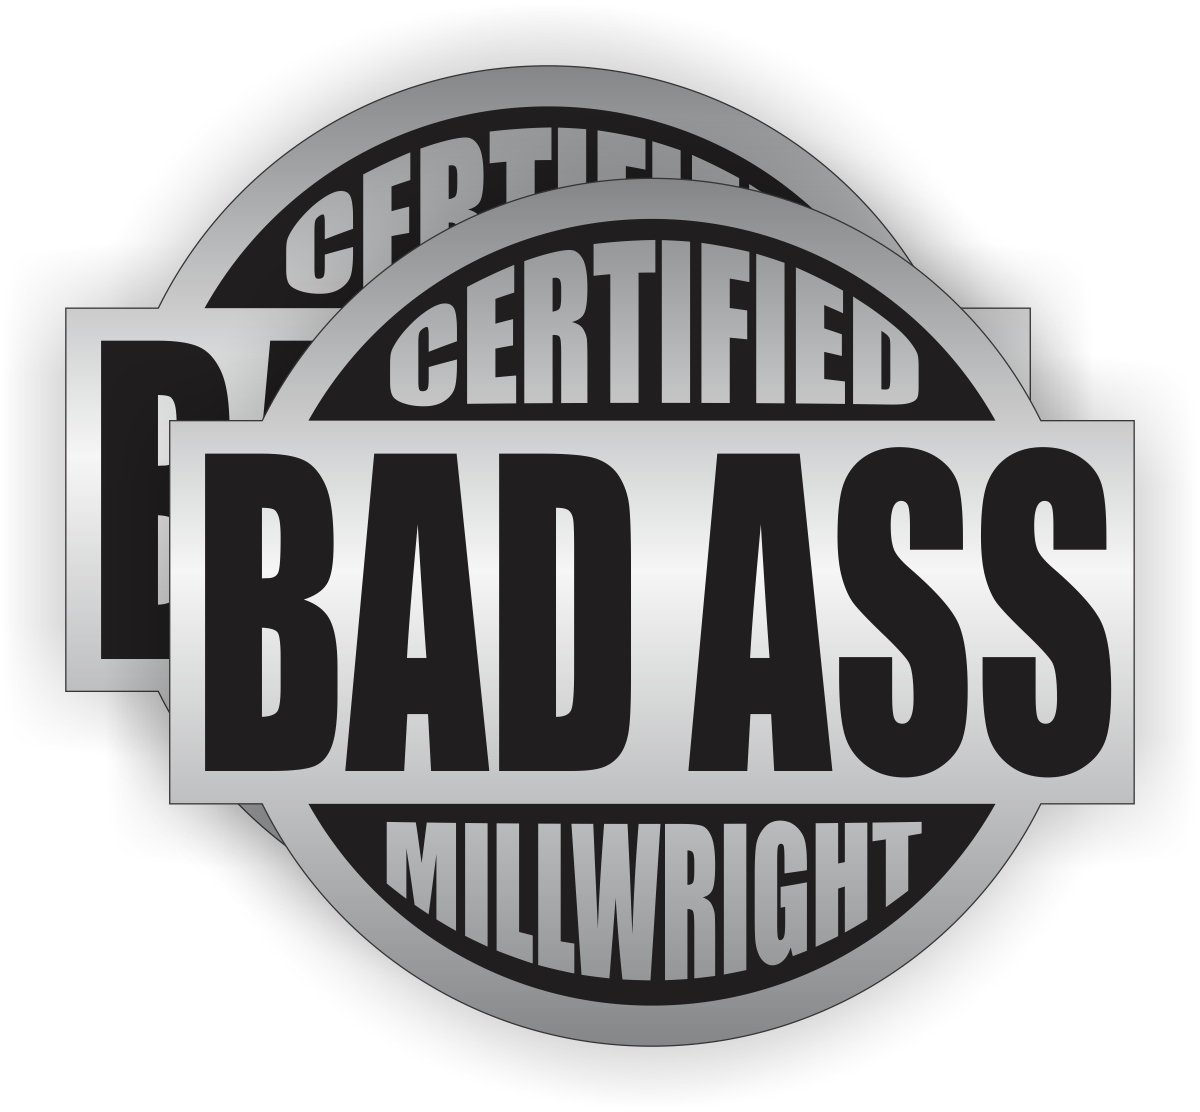 Bad Ass Millwright Hard Hat Sticker Helmet Decal Label Lunch Tool Box